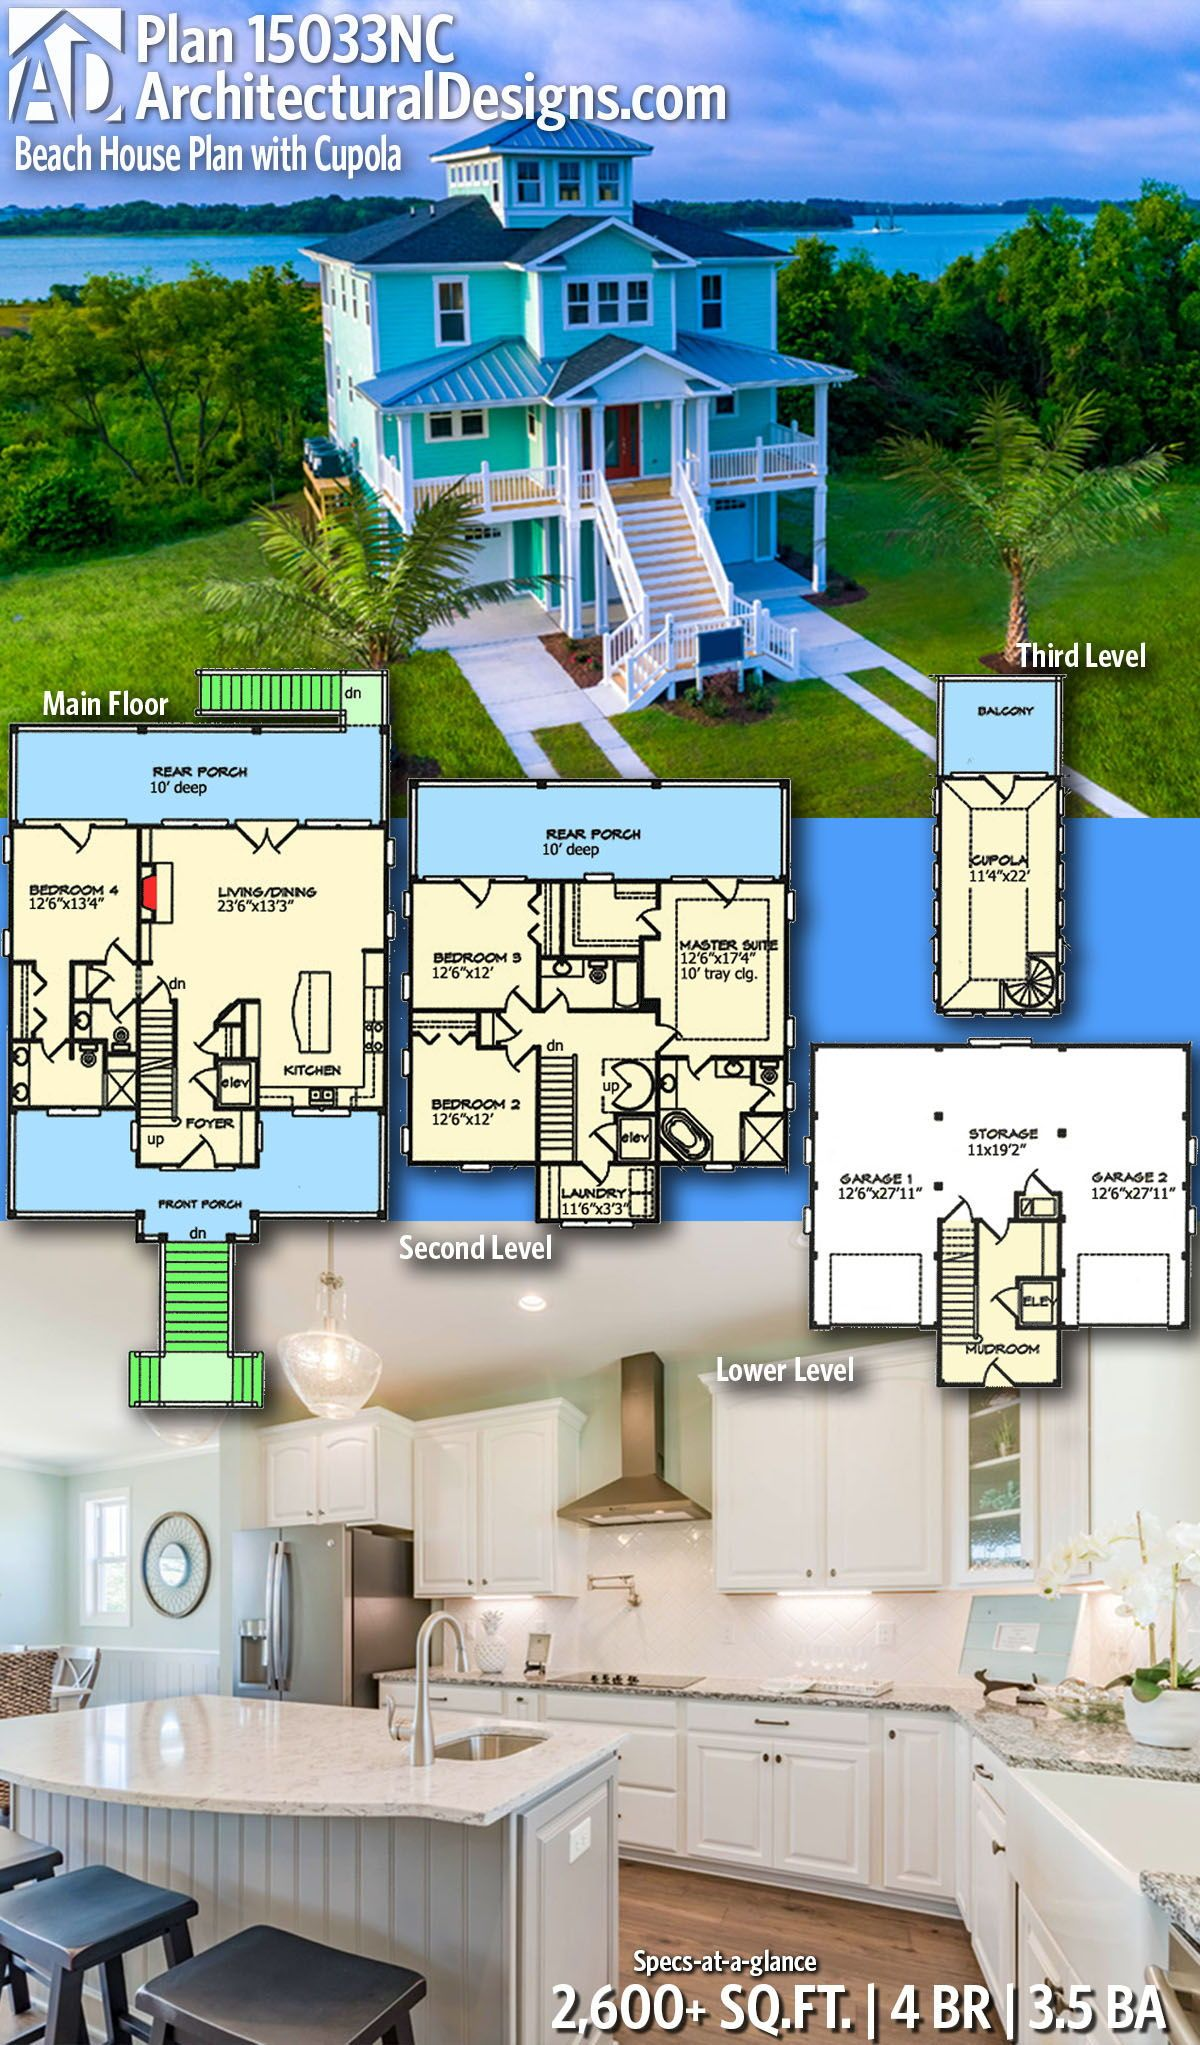 Plan 15033nc Beach House Plan With Cupola Beach House Floor Plans Beach House Plan Coastal House Plans